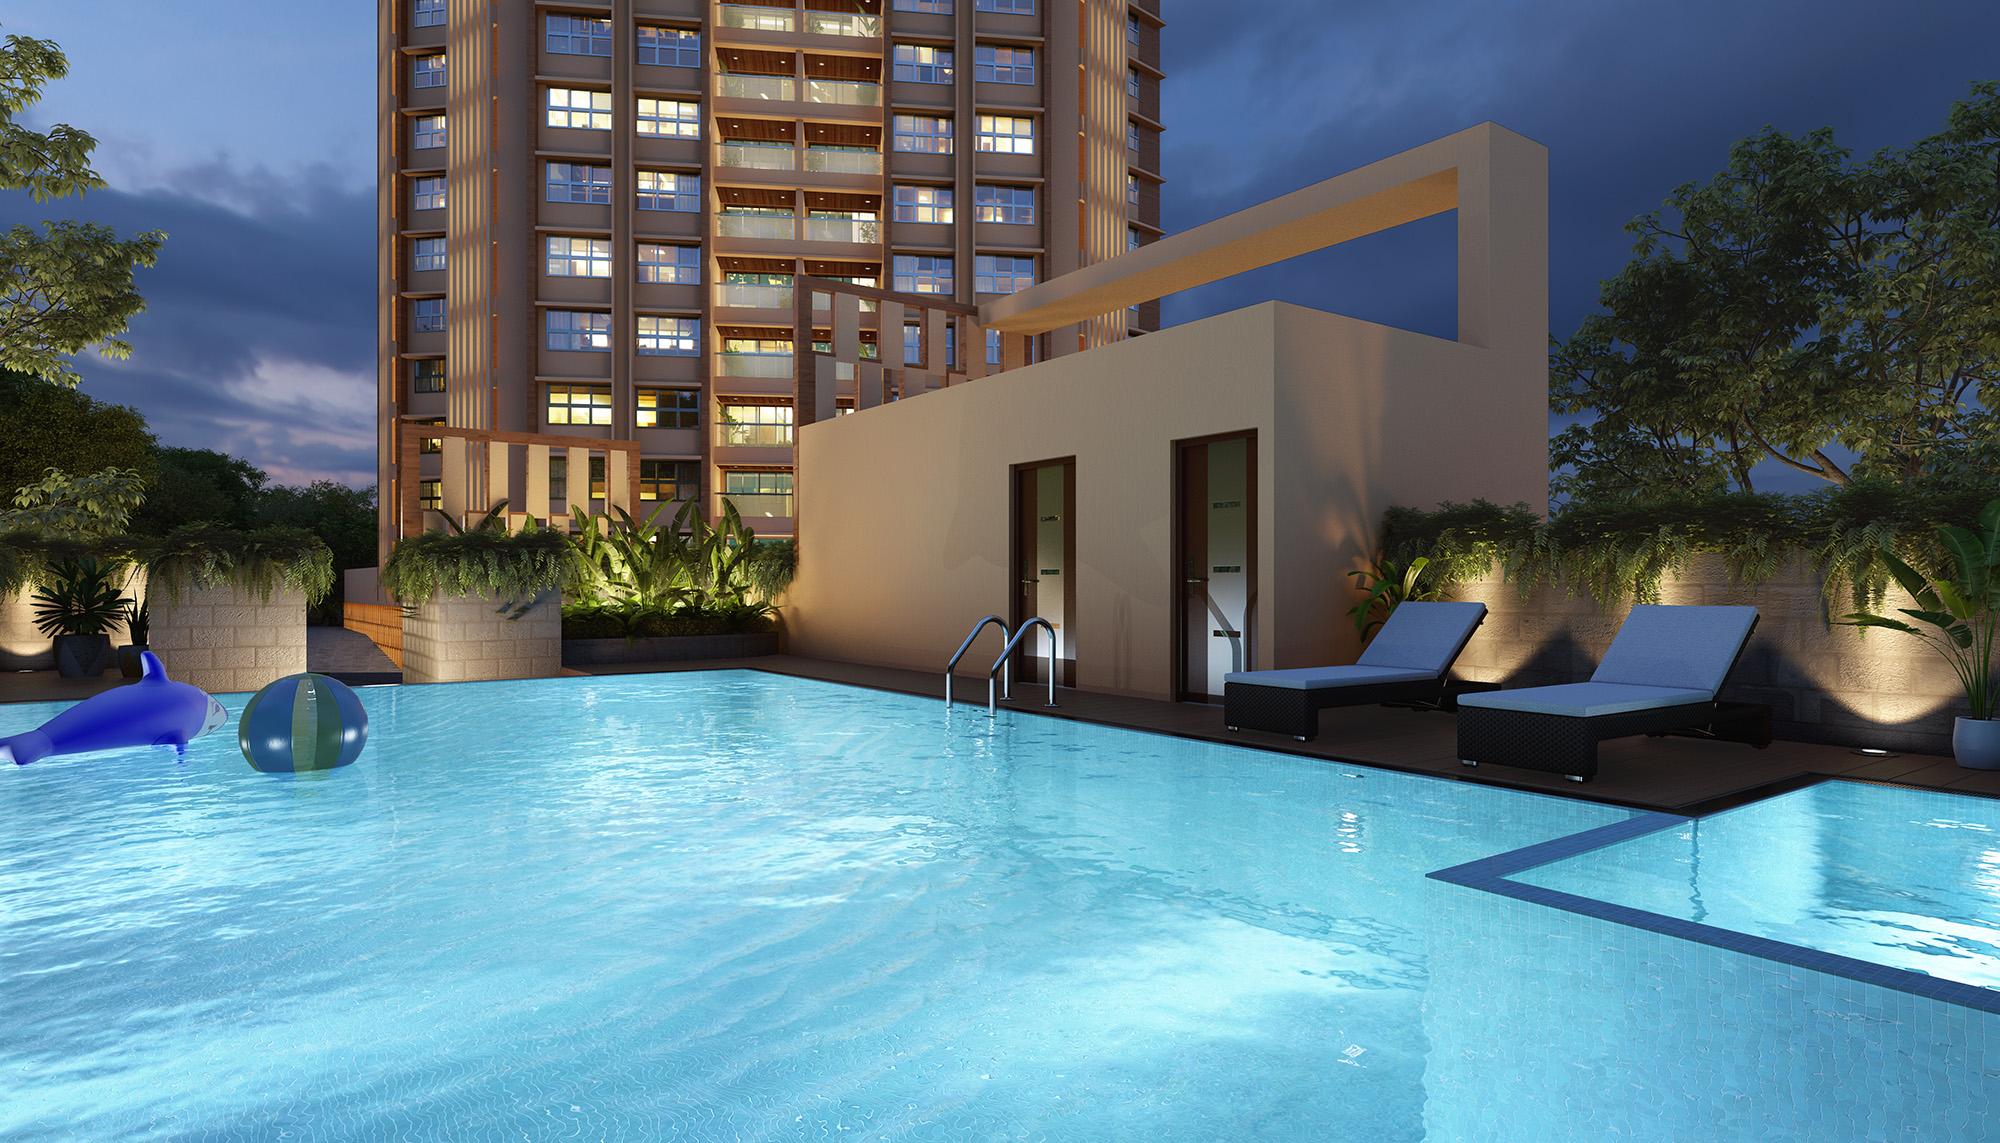 Bhk Flats In Nibm Road Pune 3bhk Apartments In Pune Vtp Celesta